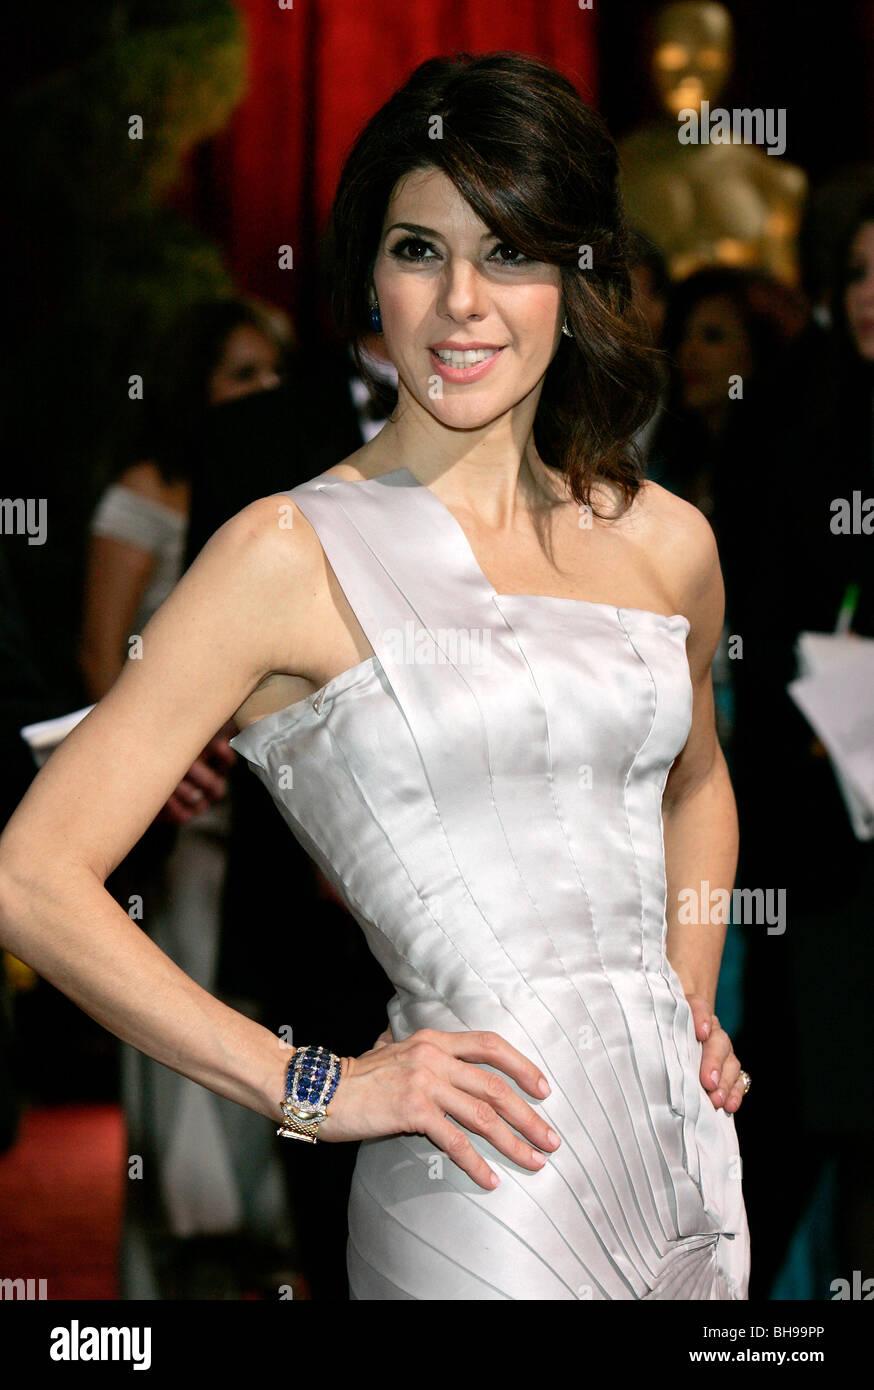 MARISA TOMEI ACTRESS KODAK THEATRE  HOLLYWOOD  USA 22/02/2009 - Stock Image